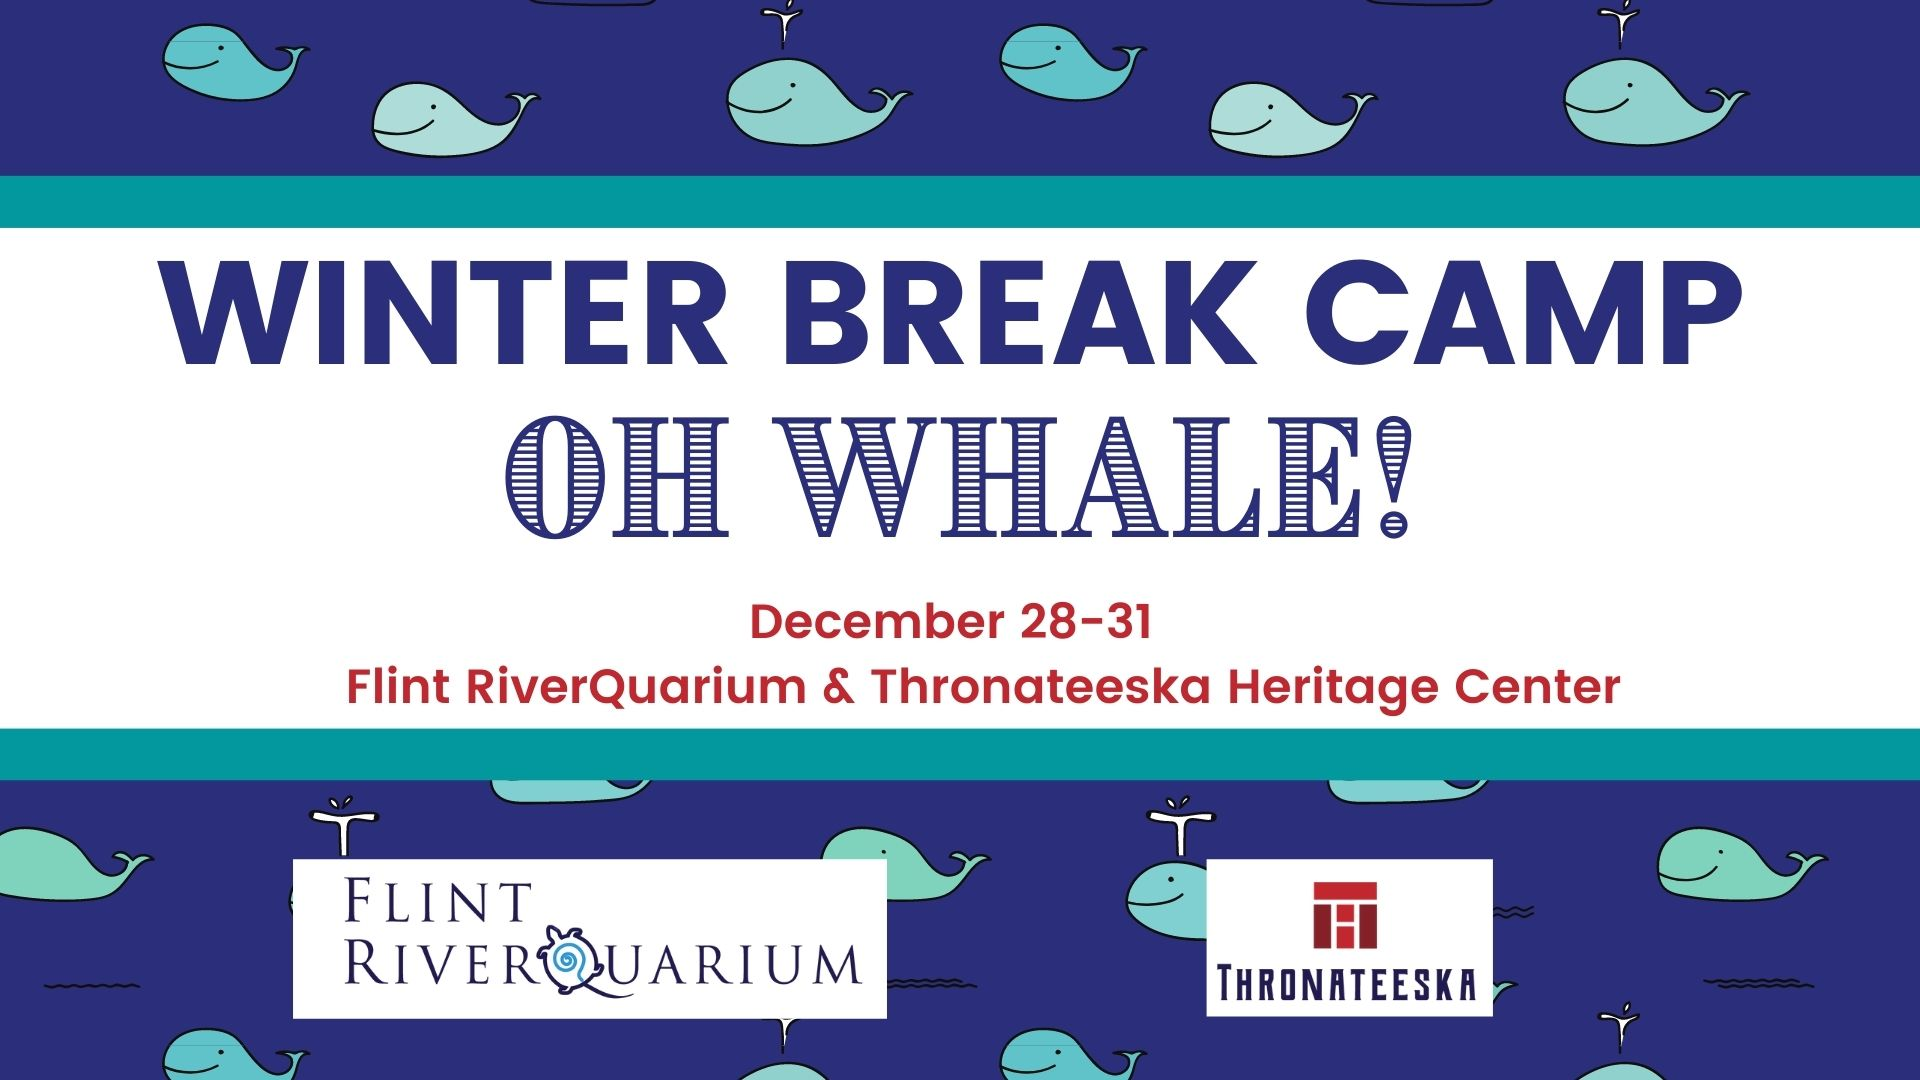 Winter Break Camp: Oh Whale!